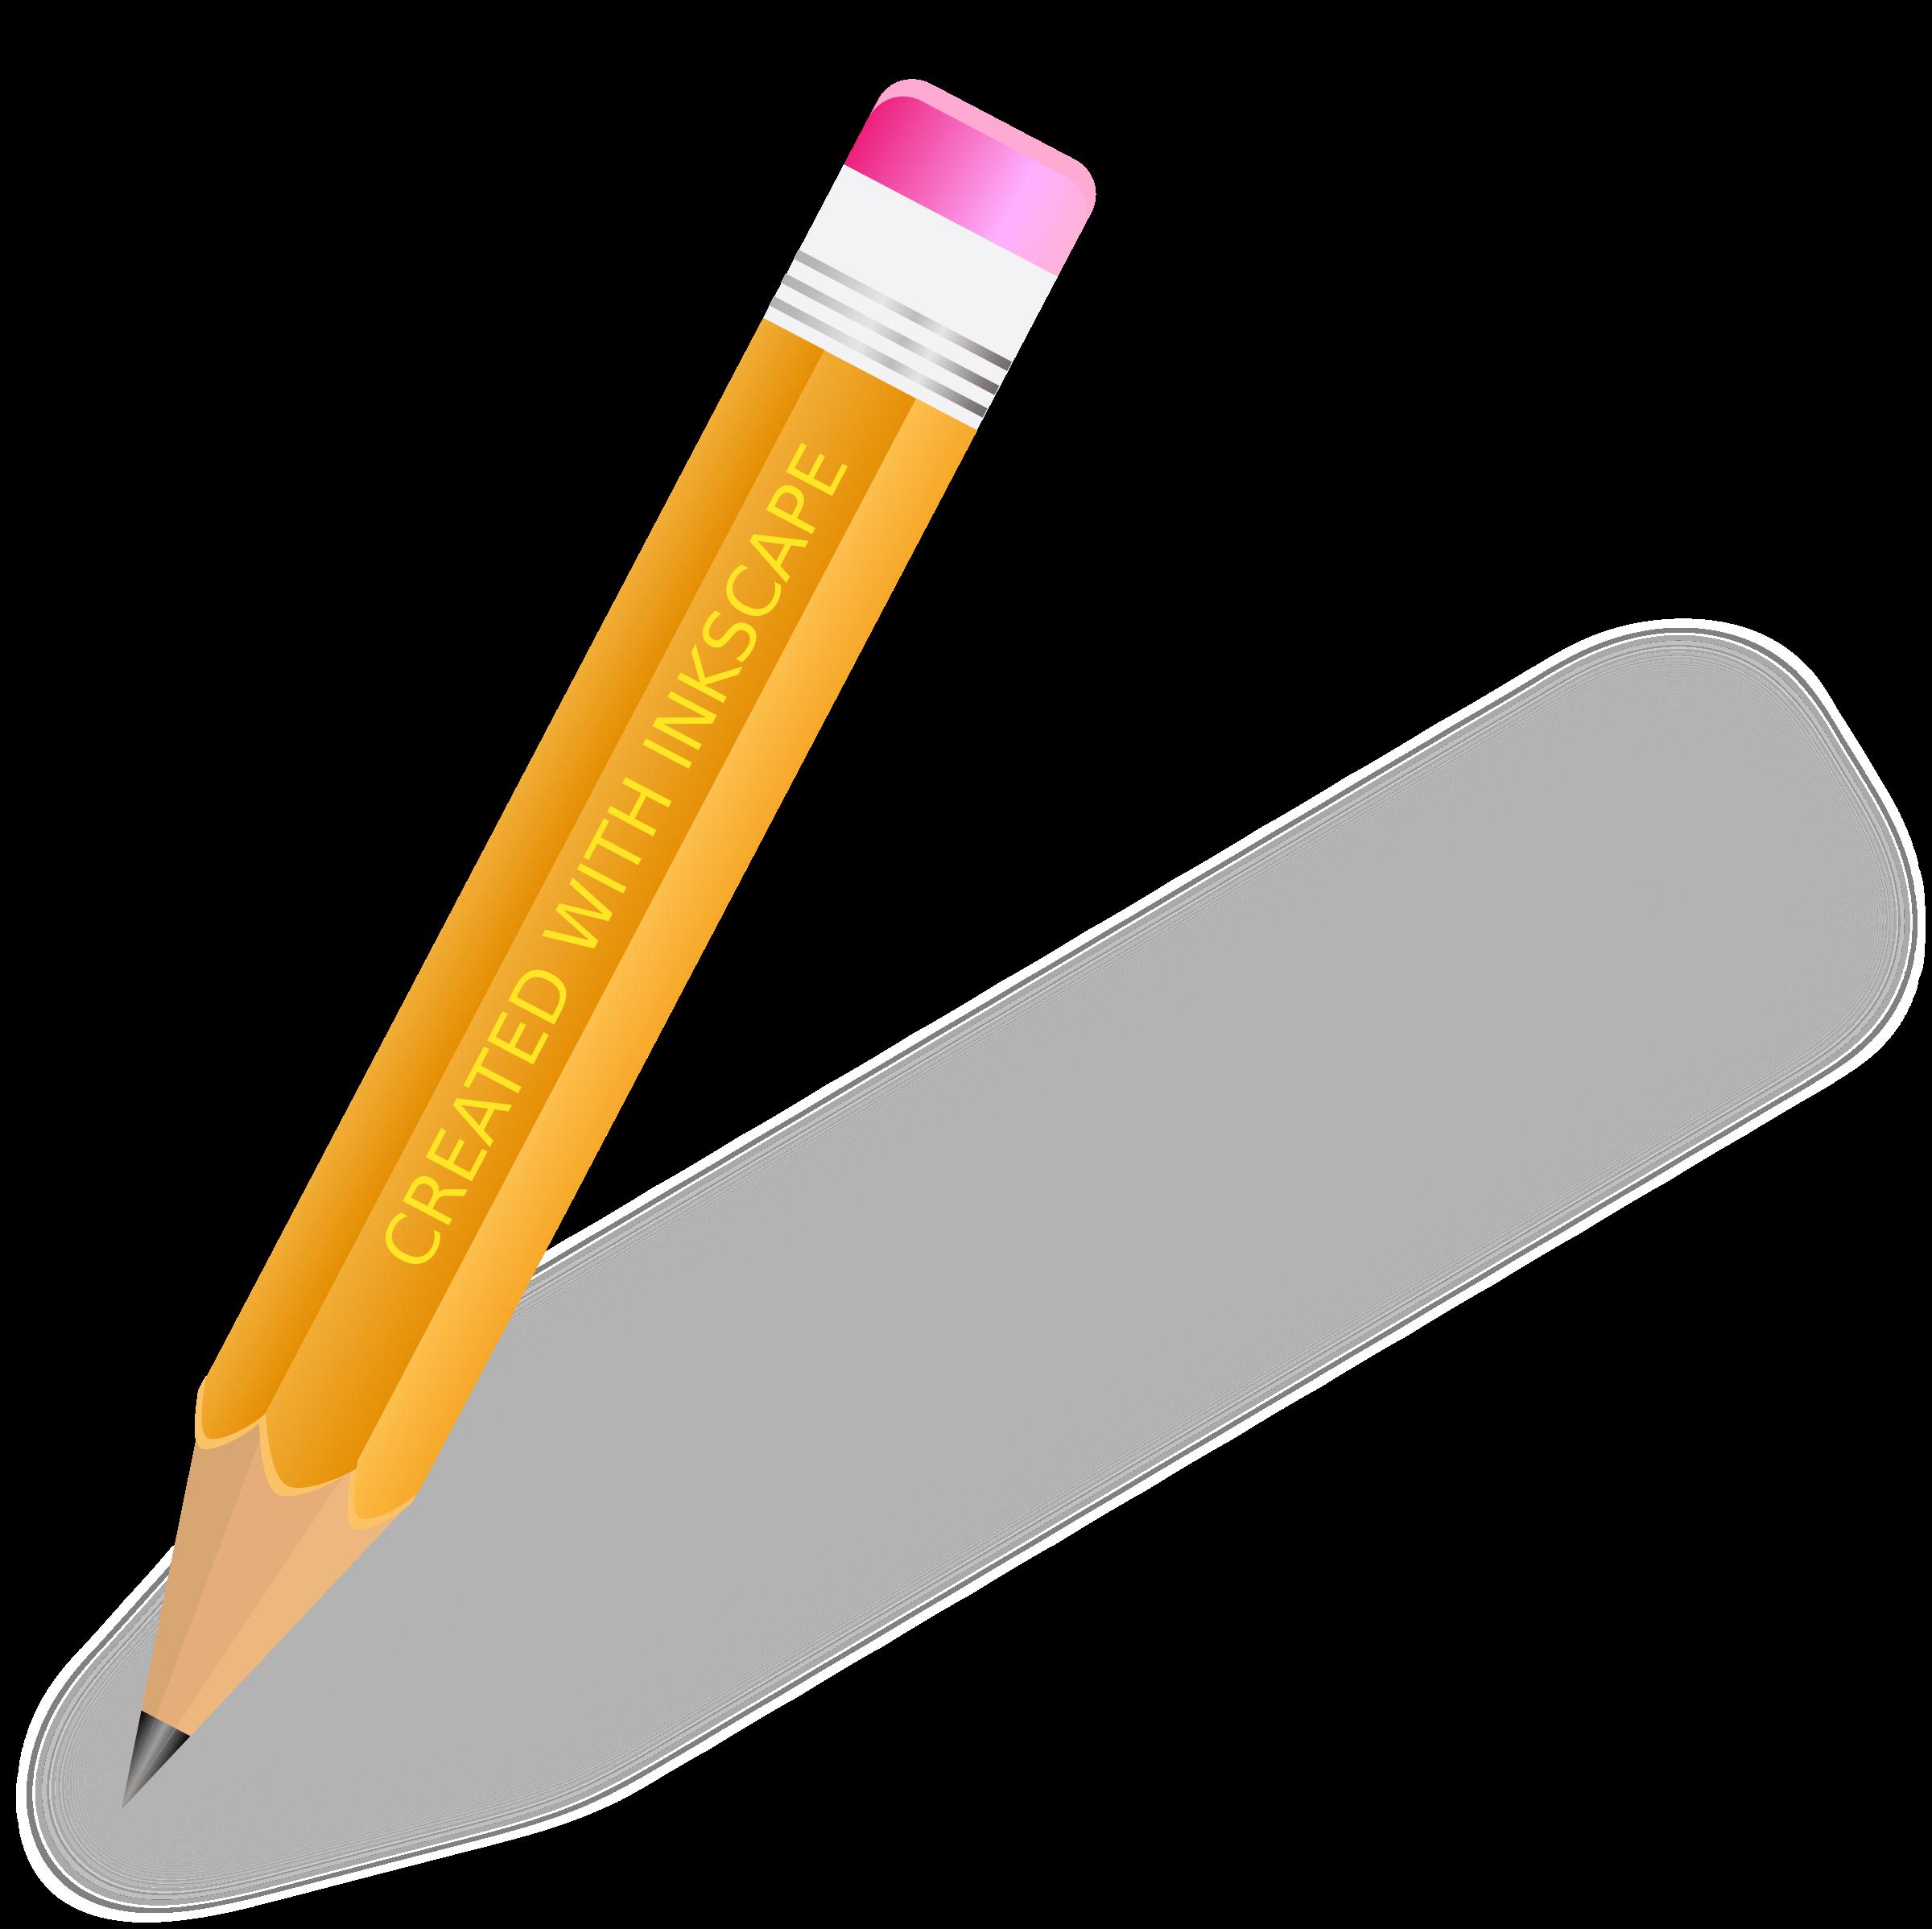 Pencil clip art transprent. Eraser clipart yellow